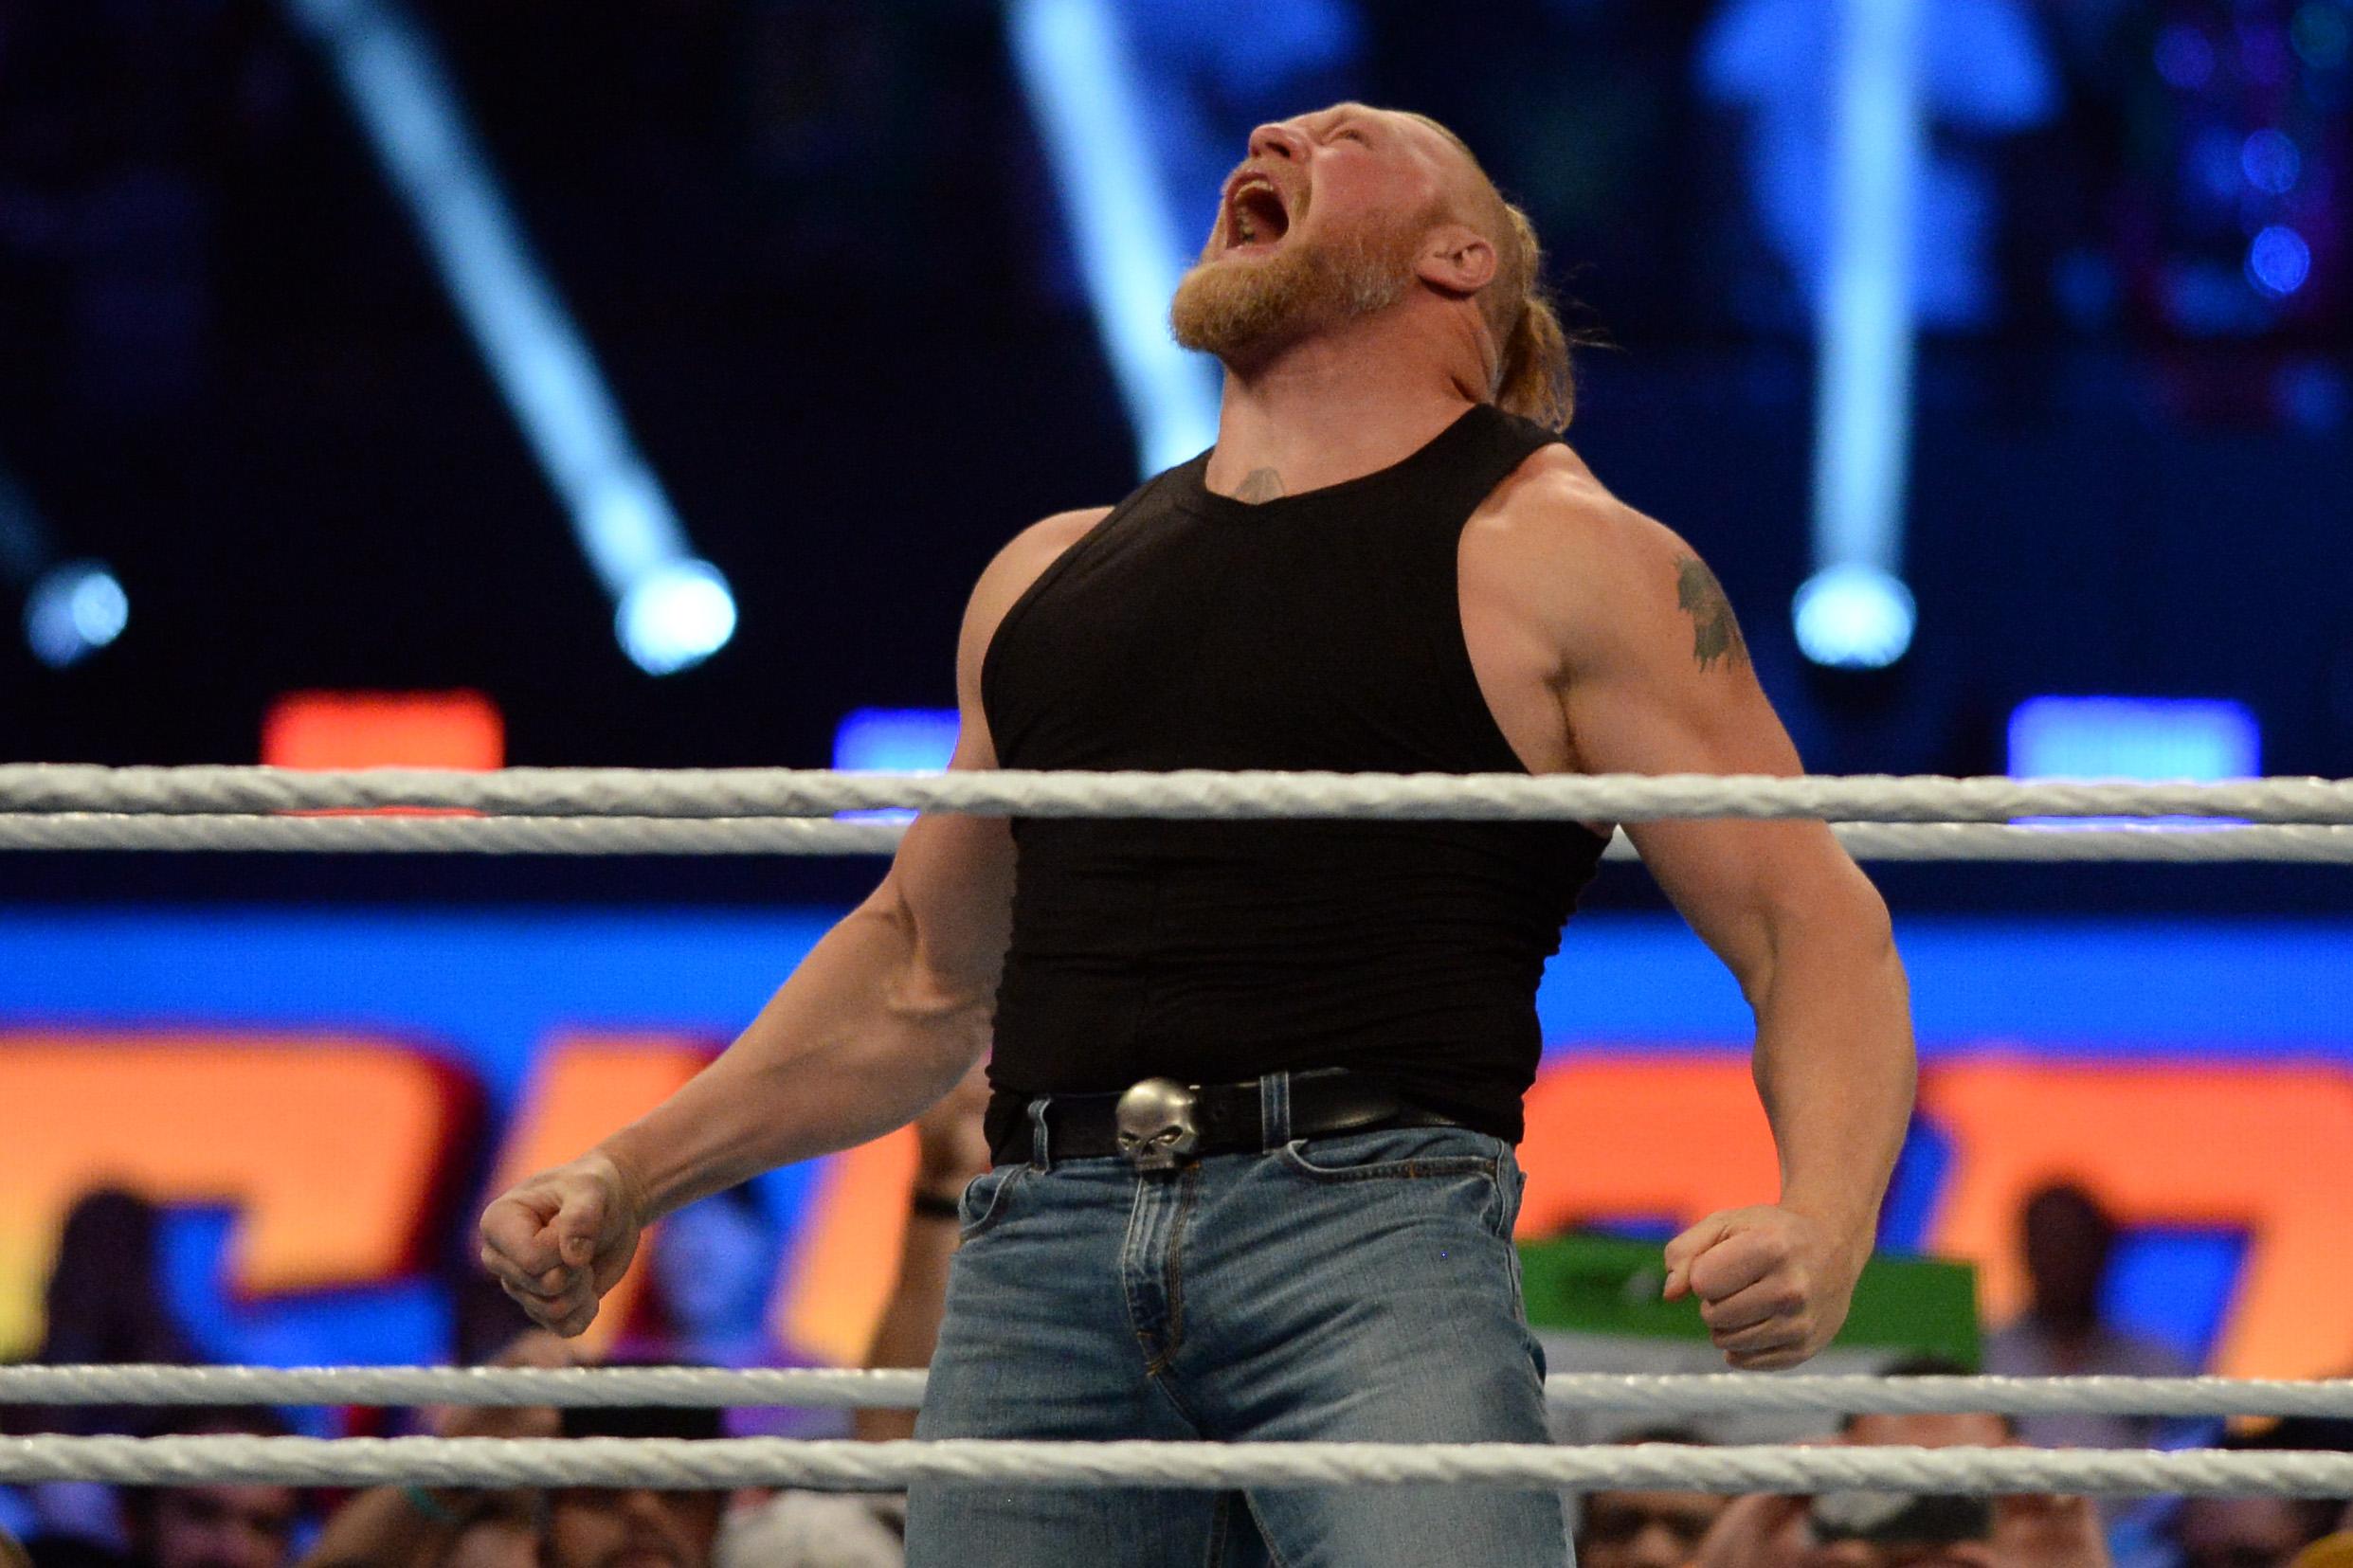 Wrestling: WWE SummerSlam 2021